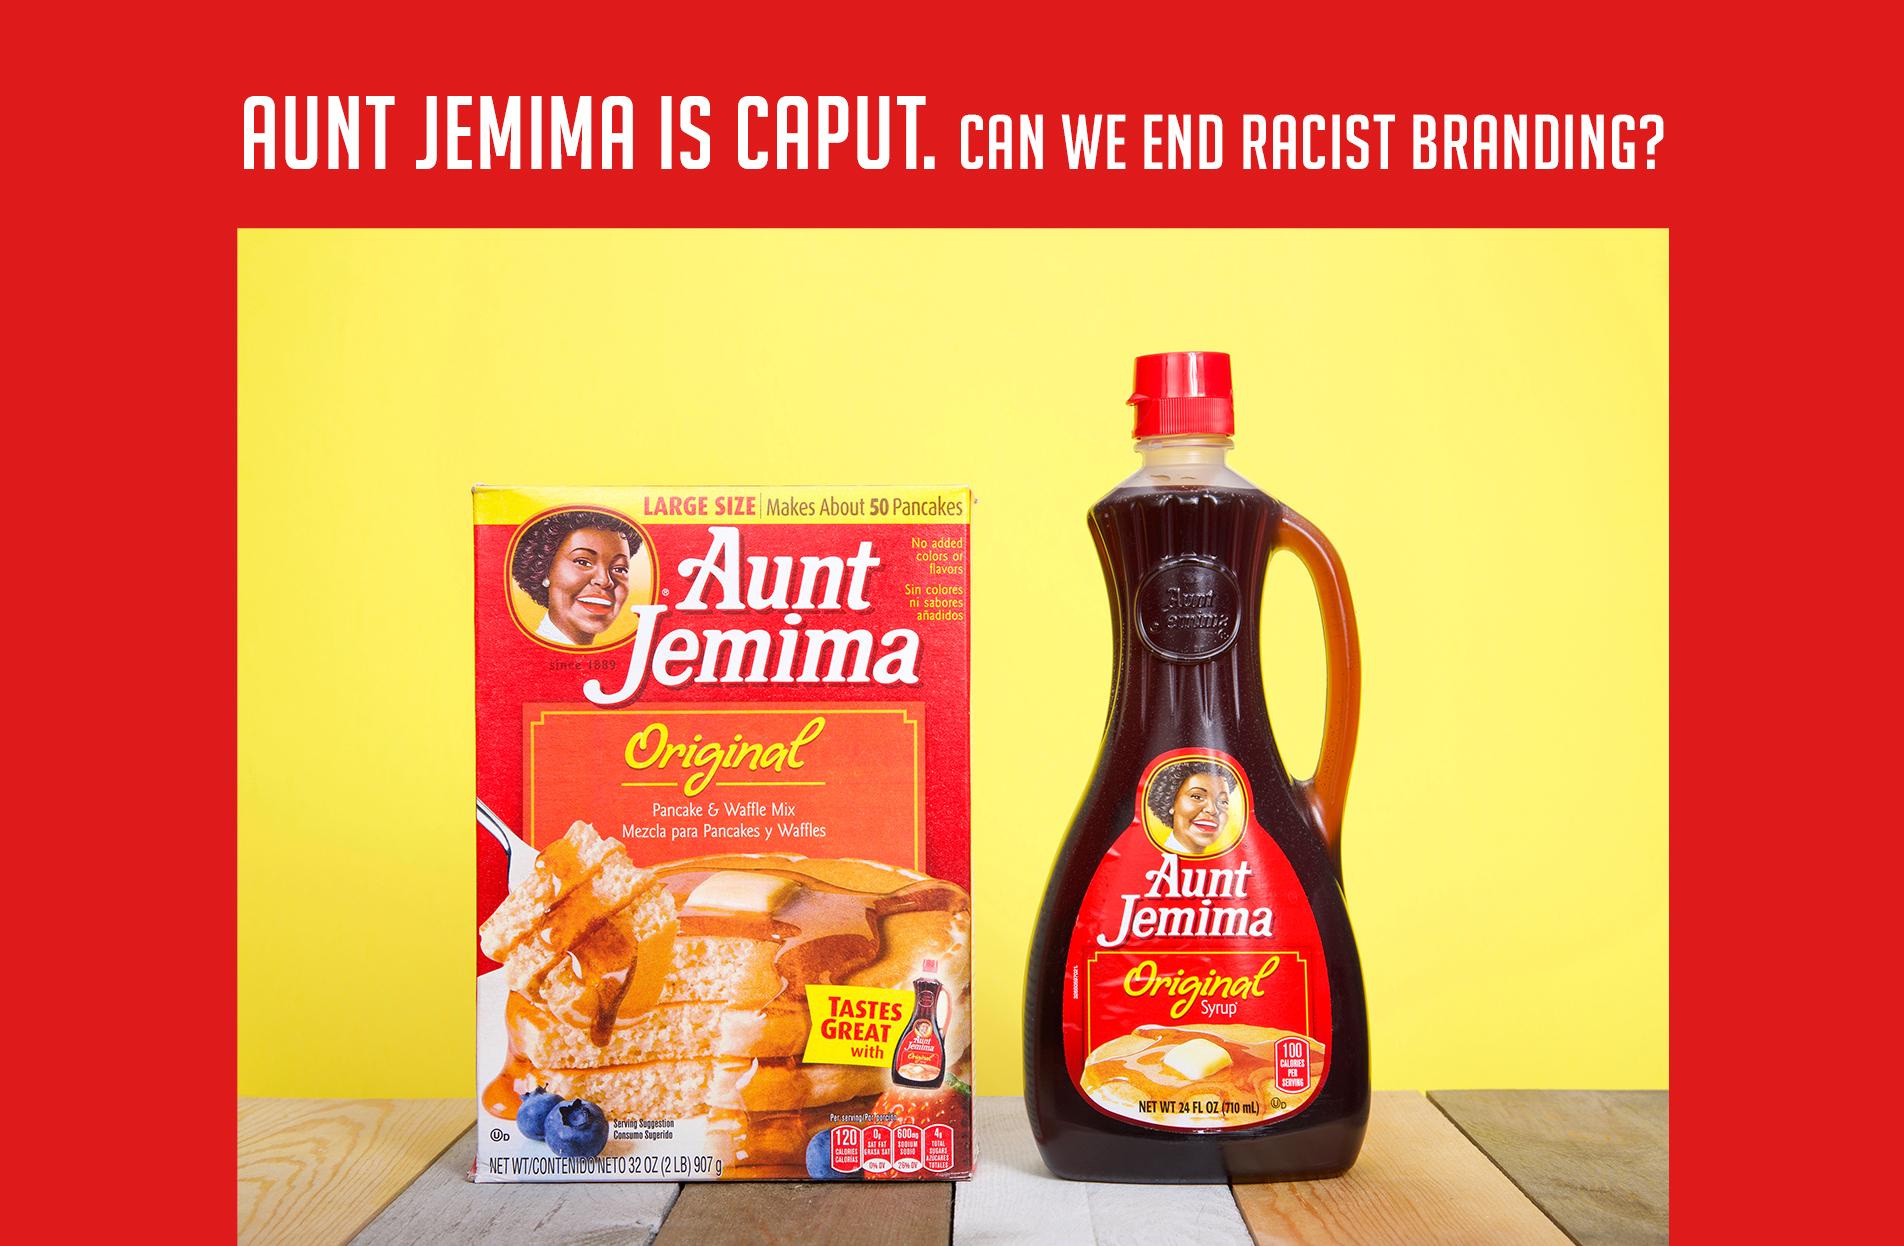 aunt jemima rebrand images